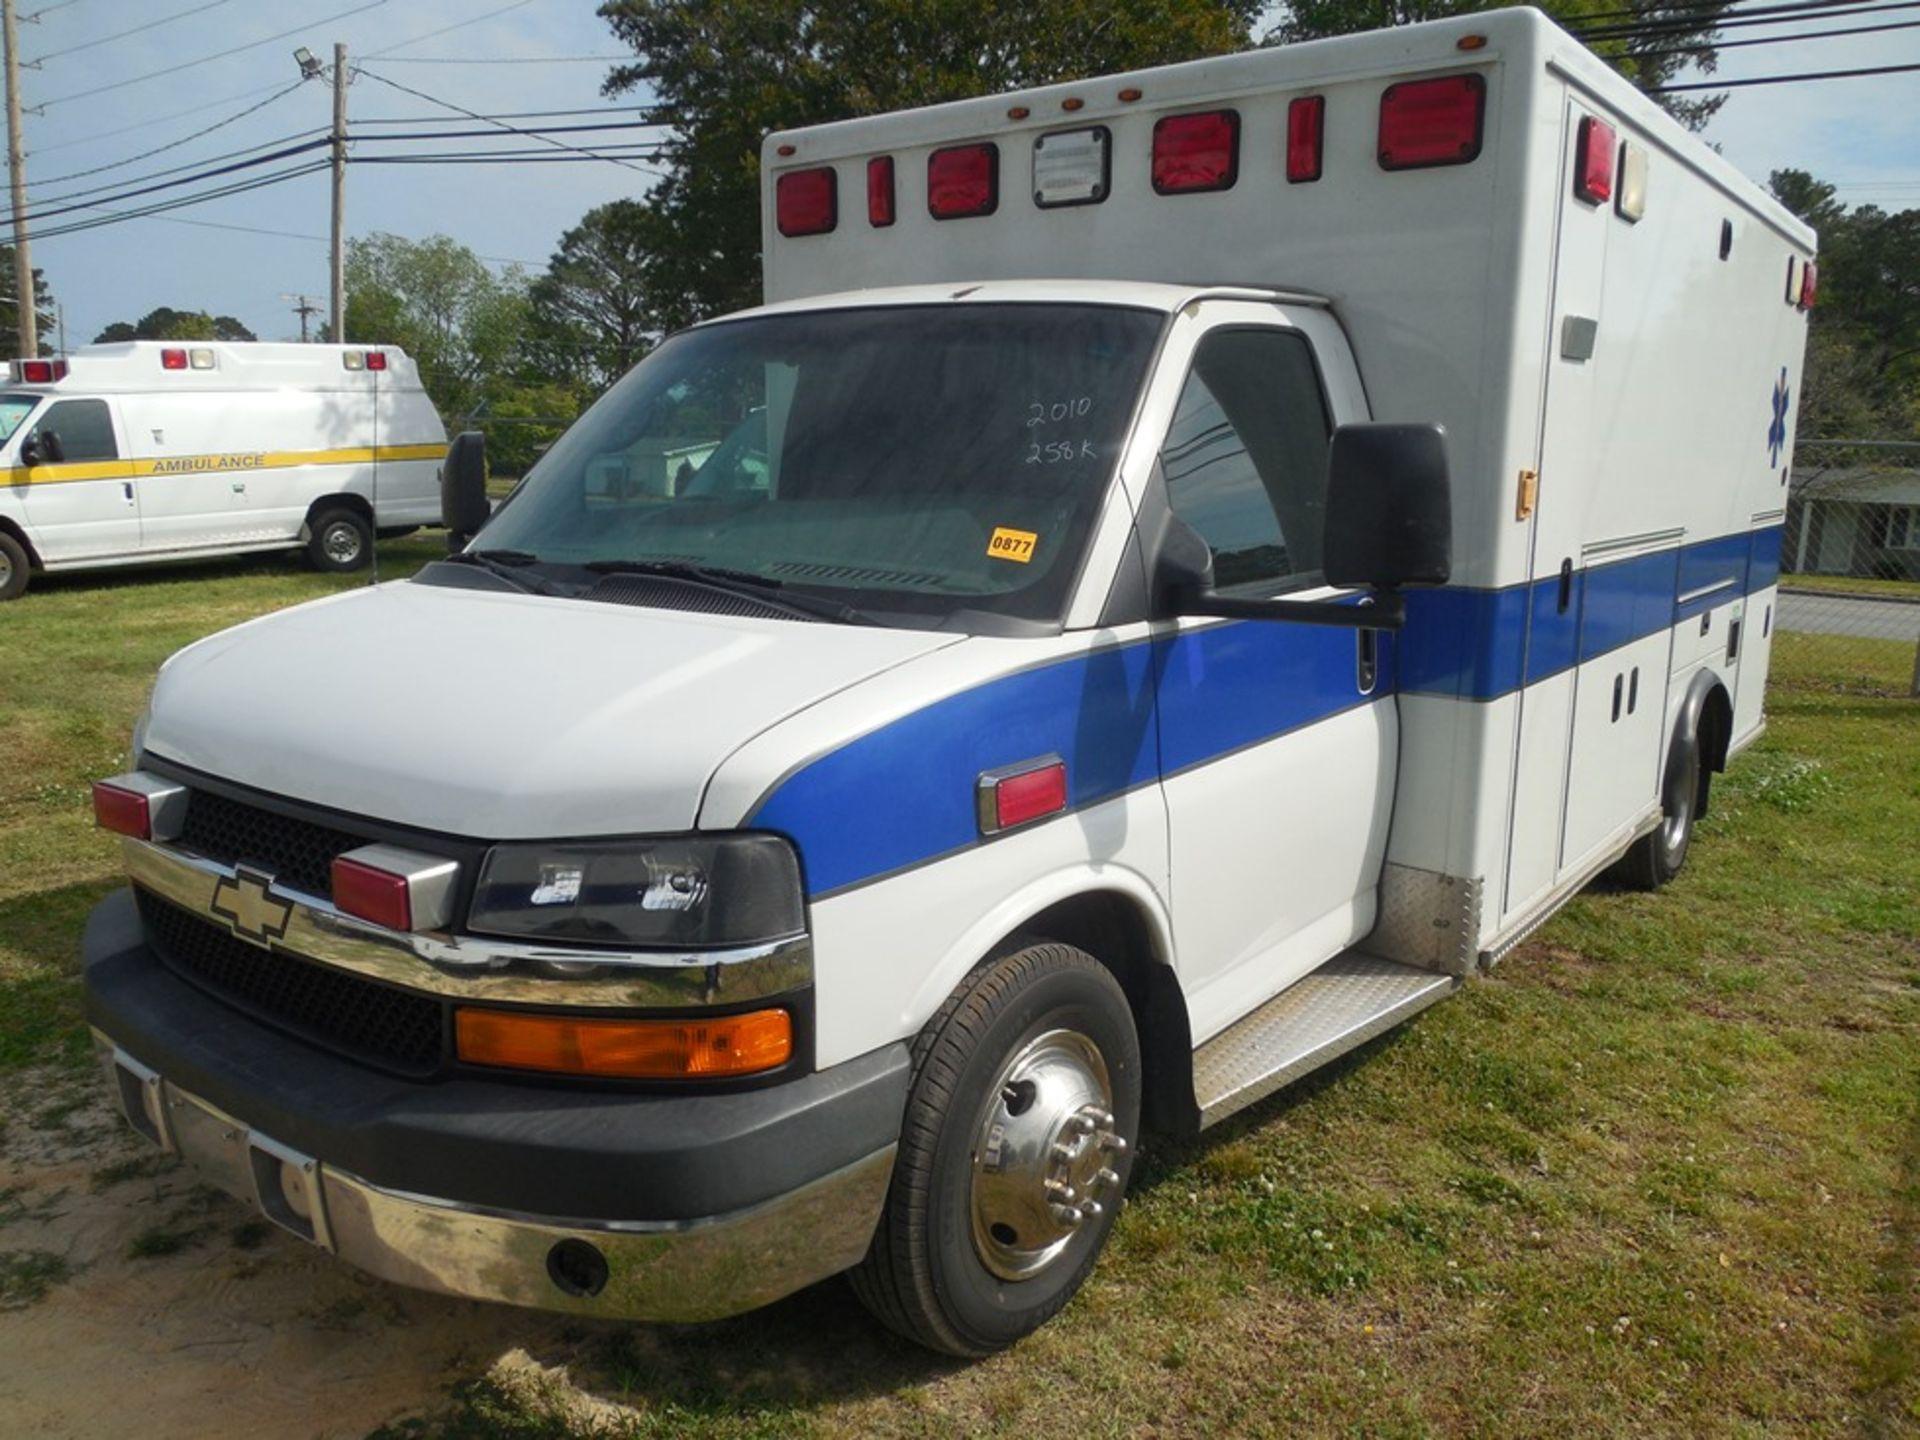 2010 Chev box van ambulance dsl, 250,597 miles, vin# 1GB9G5B65A1116120 - Image 2 of 6